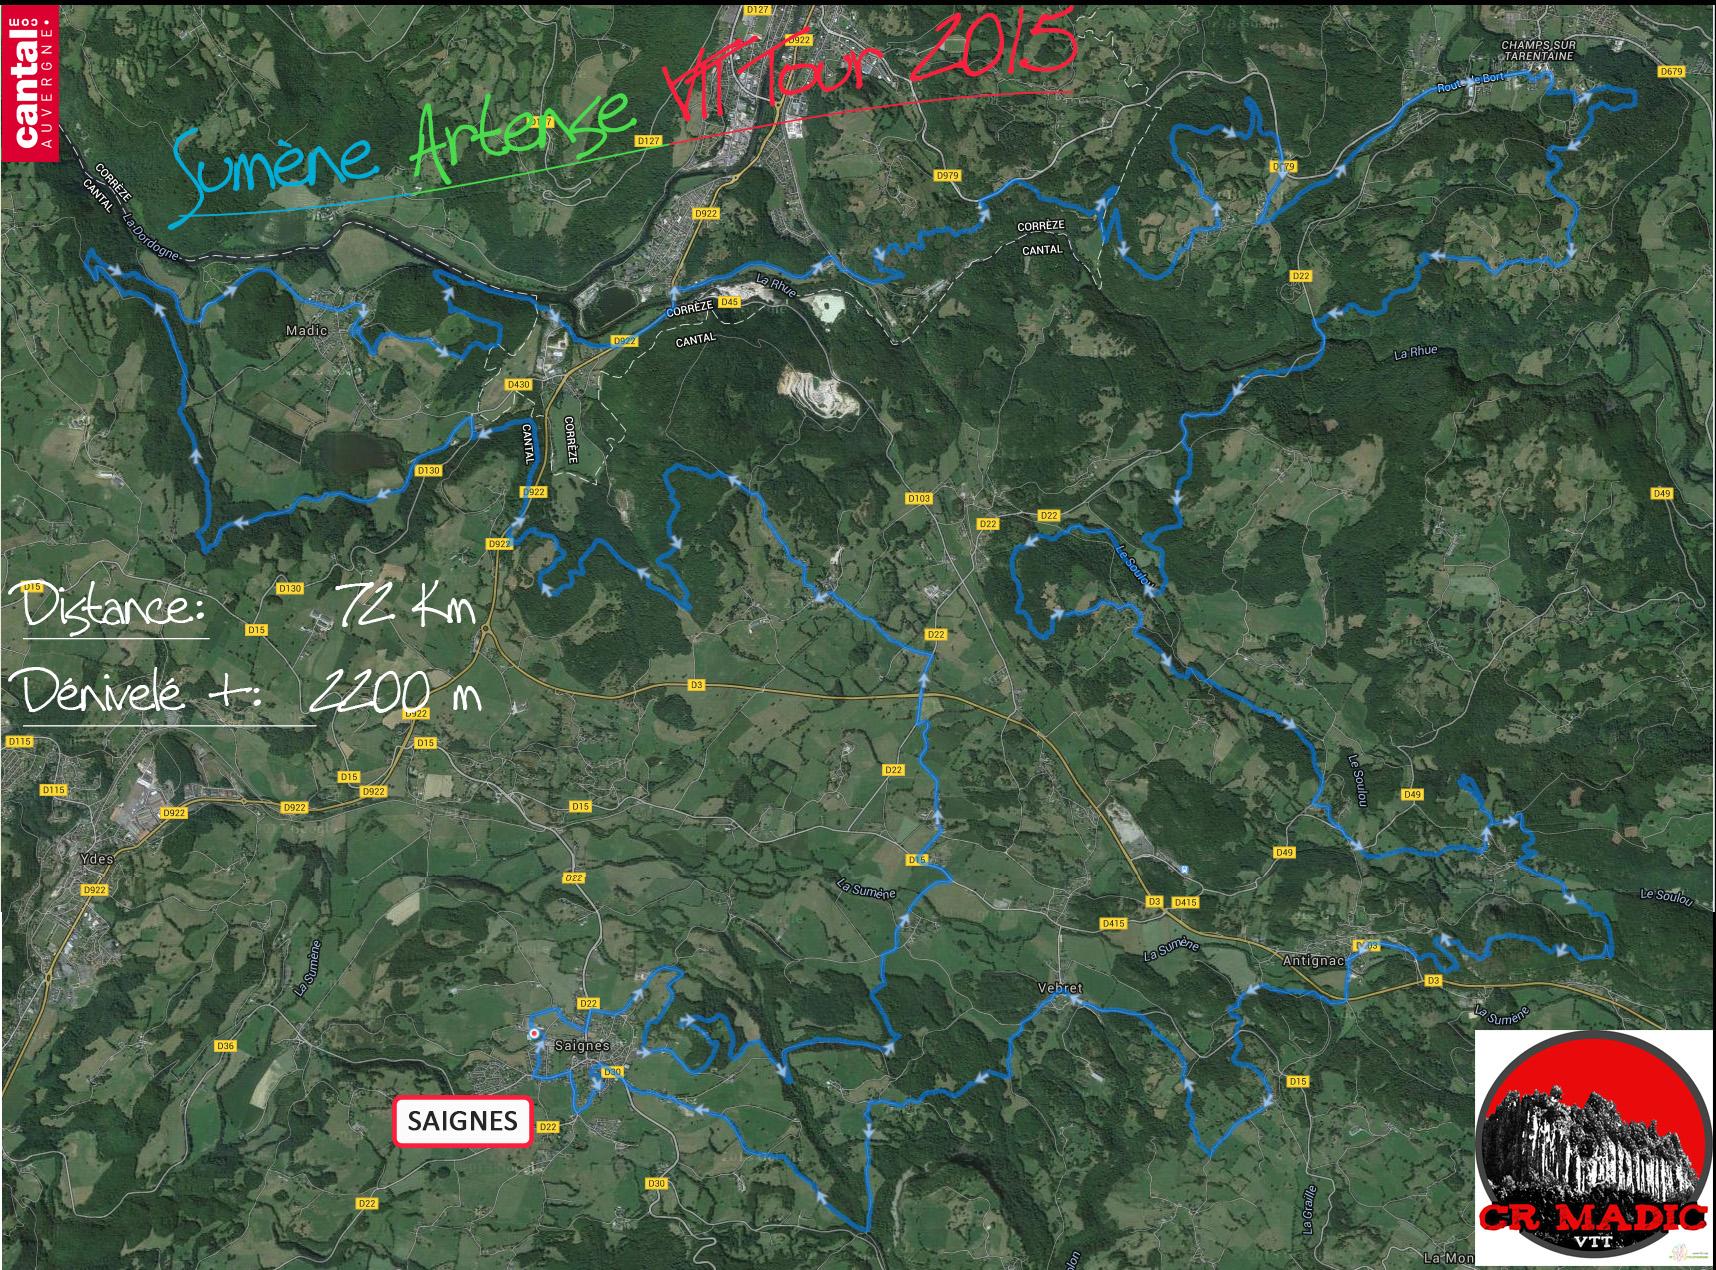 2015 savtt tour 75 km parcours v1